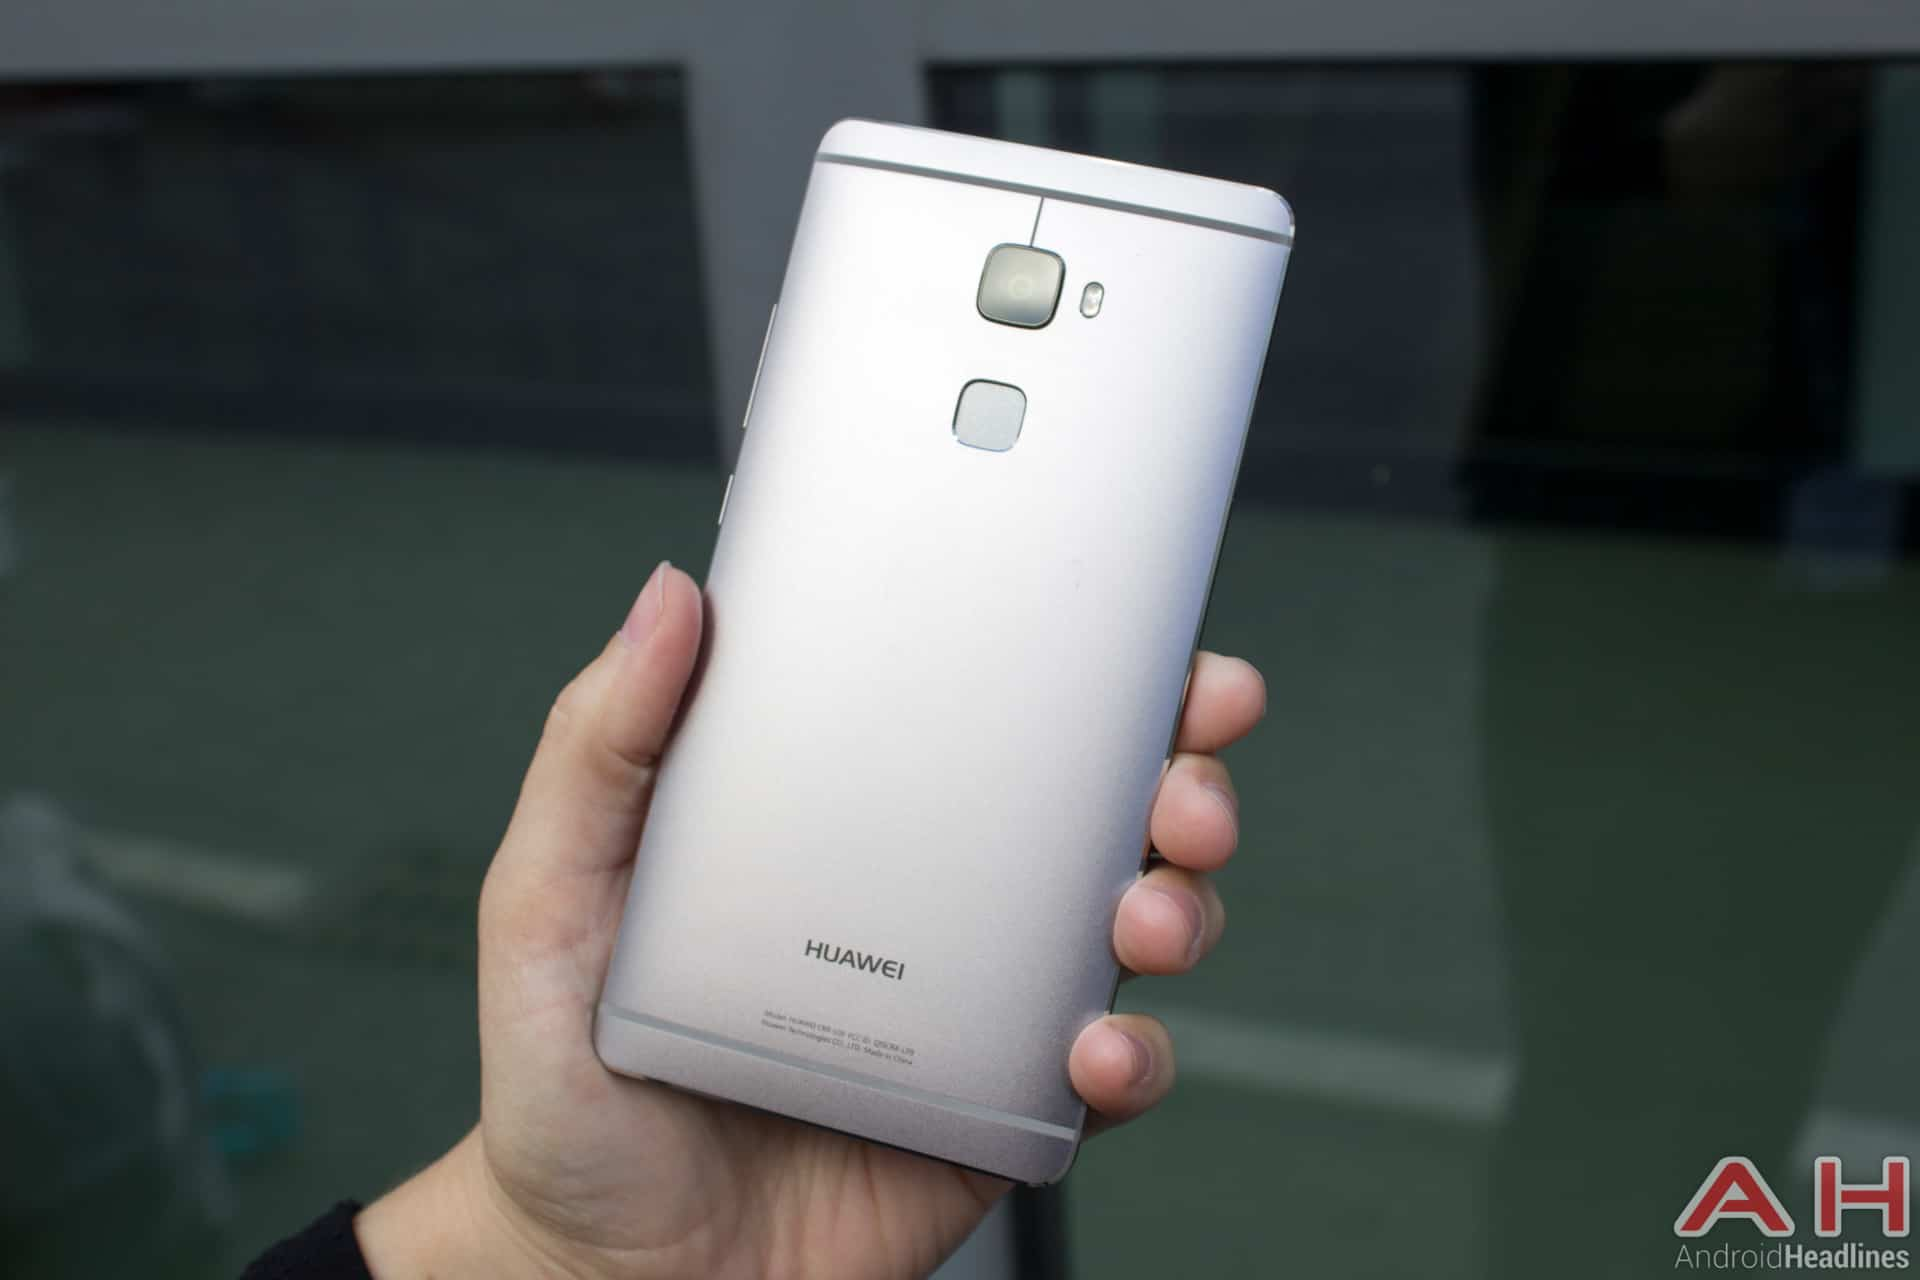 Huawei Mate S IFA AH10